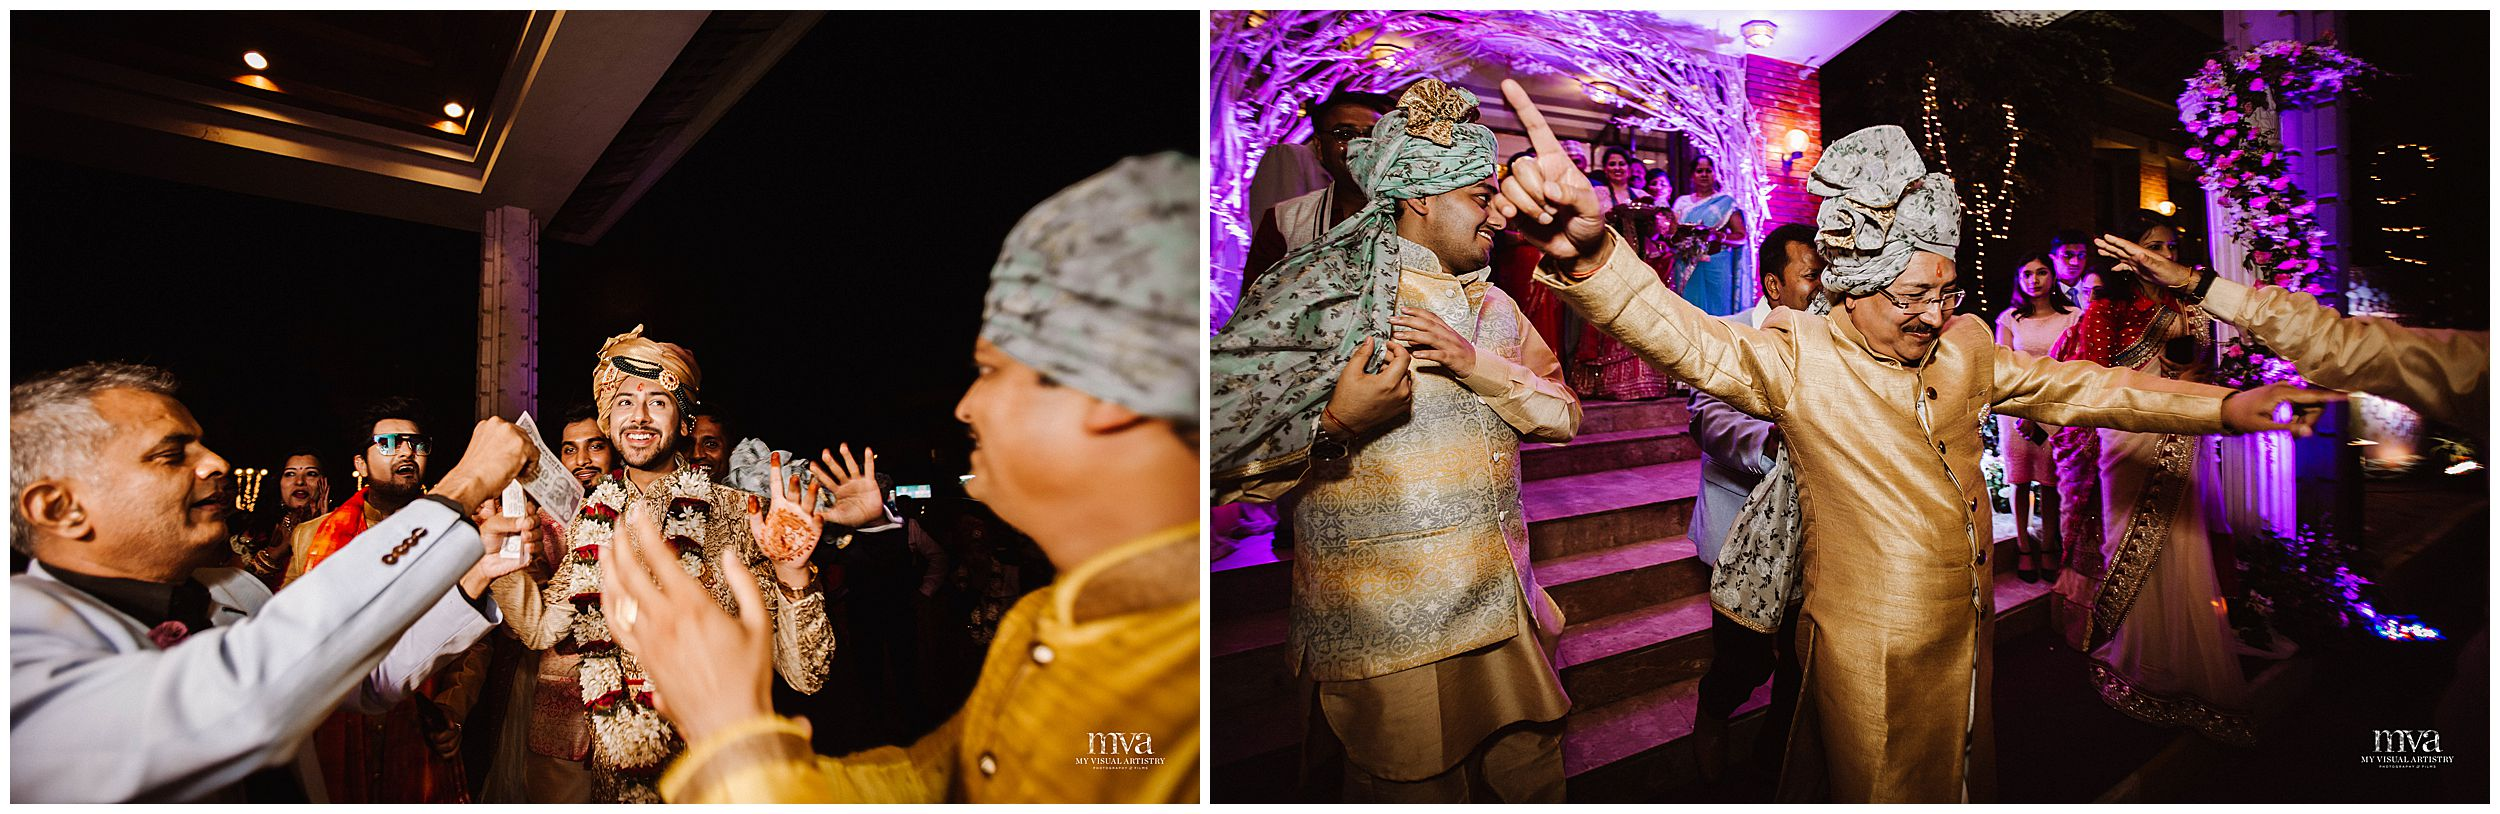 SONAAL_AMI_MYVISUALARTISTRY_WEDDING_PHOTOGRAPHY_MVA_NEPAL_KATHMANDU_SOALTEE39.jpg